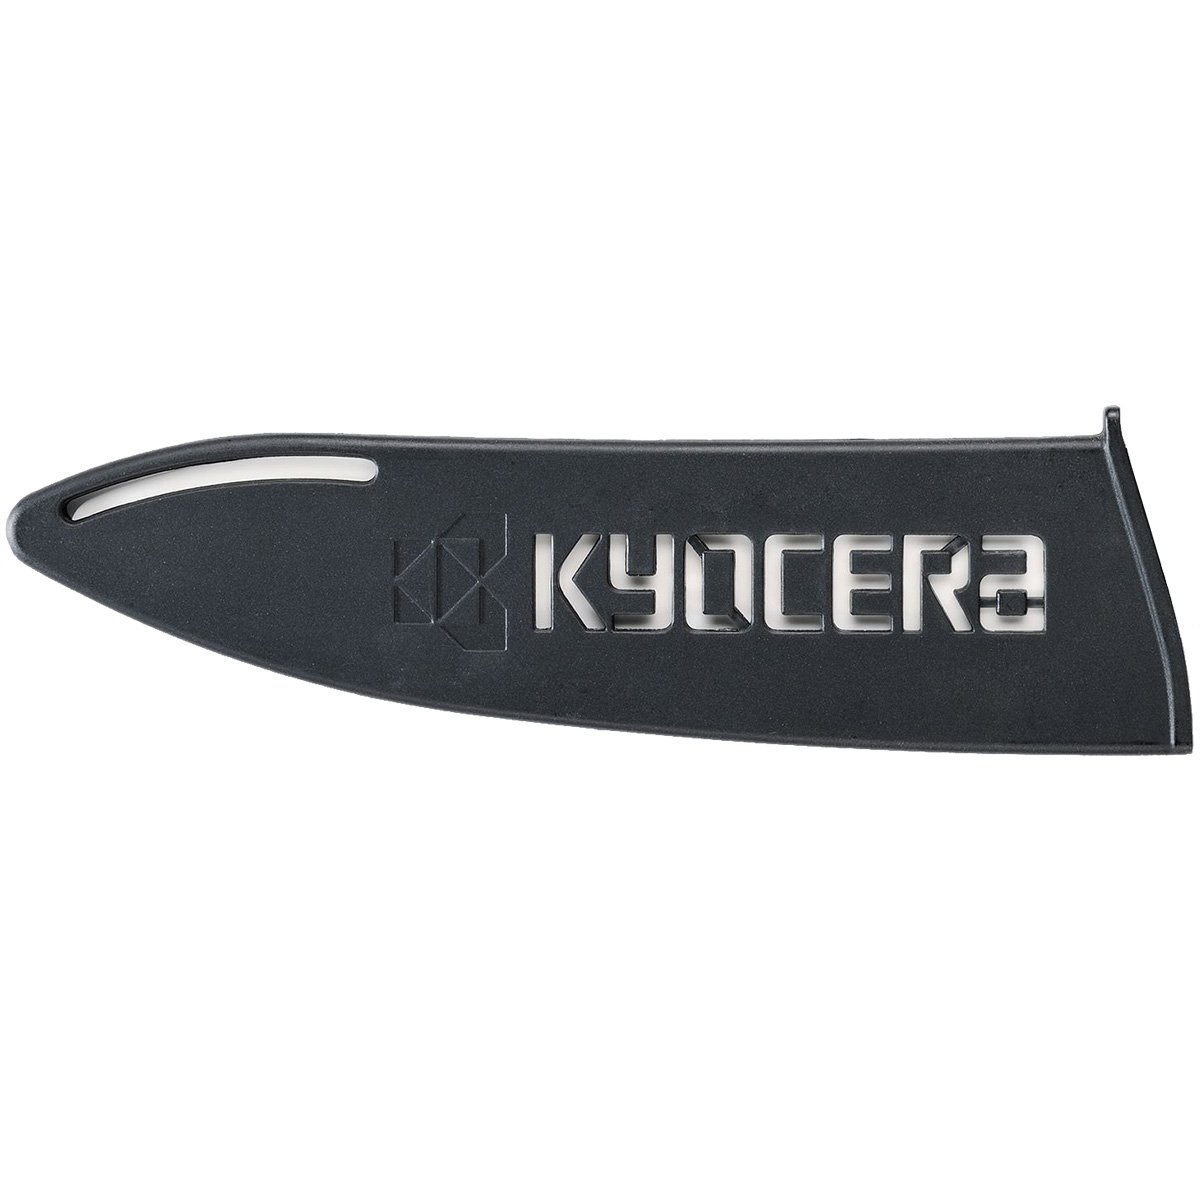 Kyocera Blade Guard, Ceramics/Plastic, Black, 28 x 28 x 18 cm H310221G